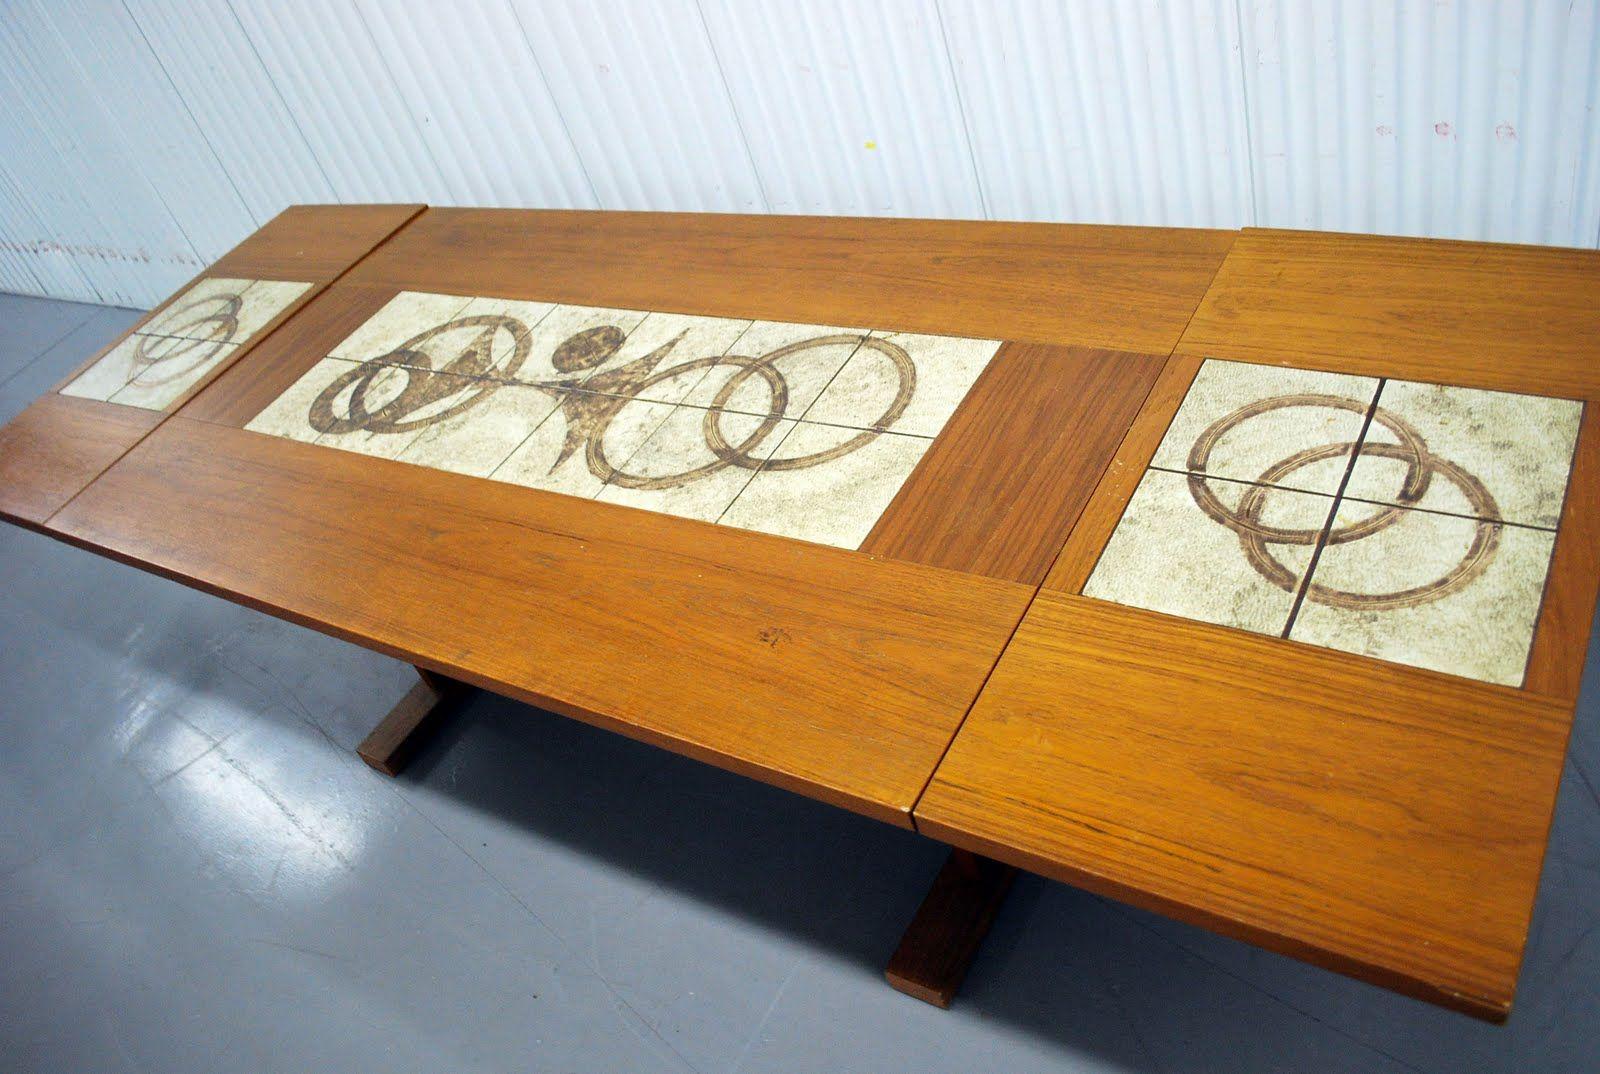 Danish Modern Dining Table Junk2funk Mid Century Danish Modern Teak Tile Drop Leaf Dining